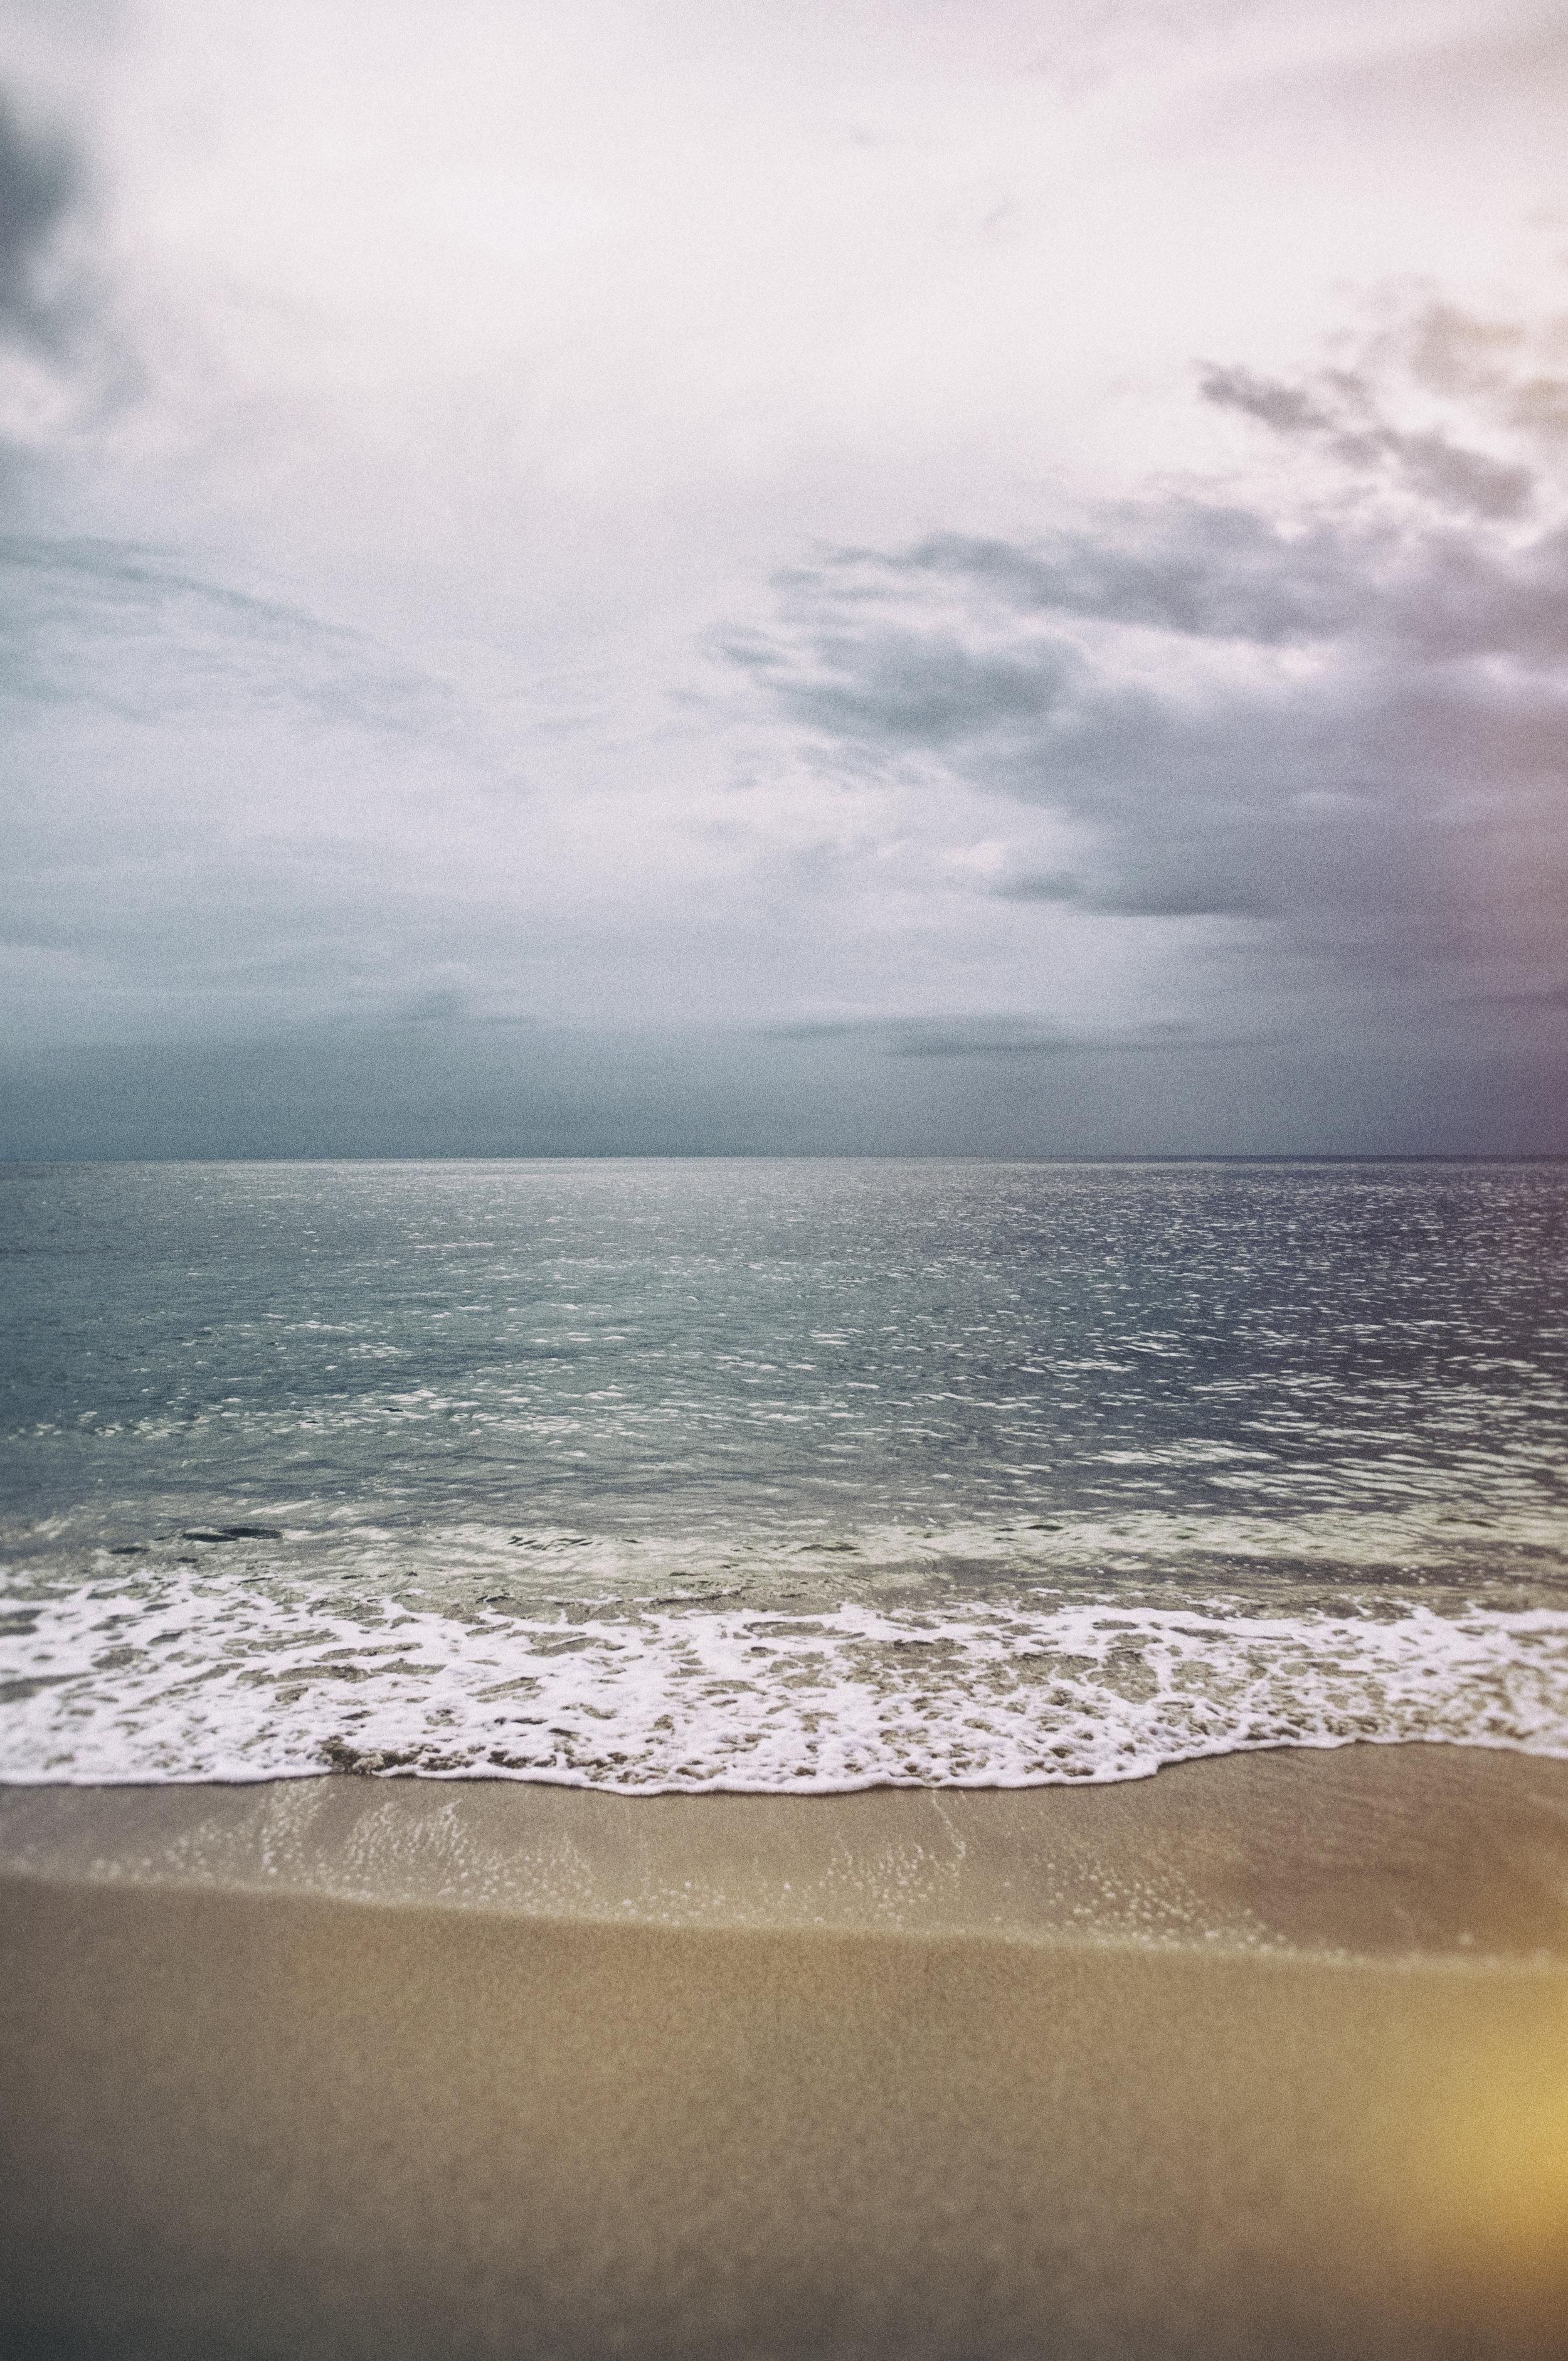 Landscape_Beach007_HI.jpg